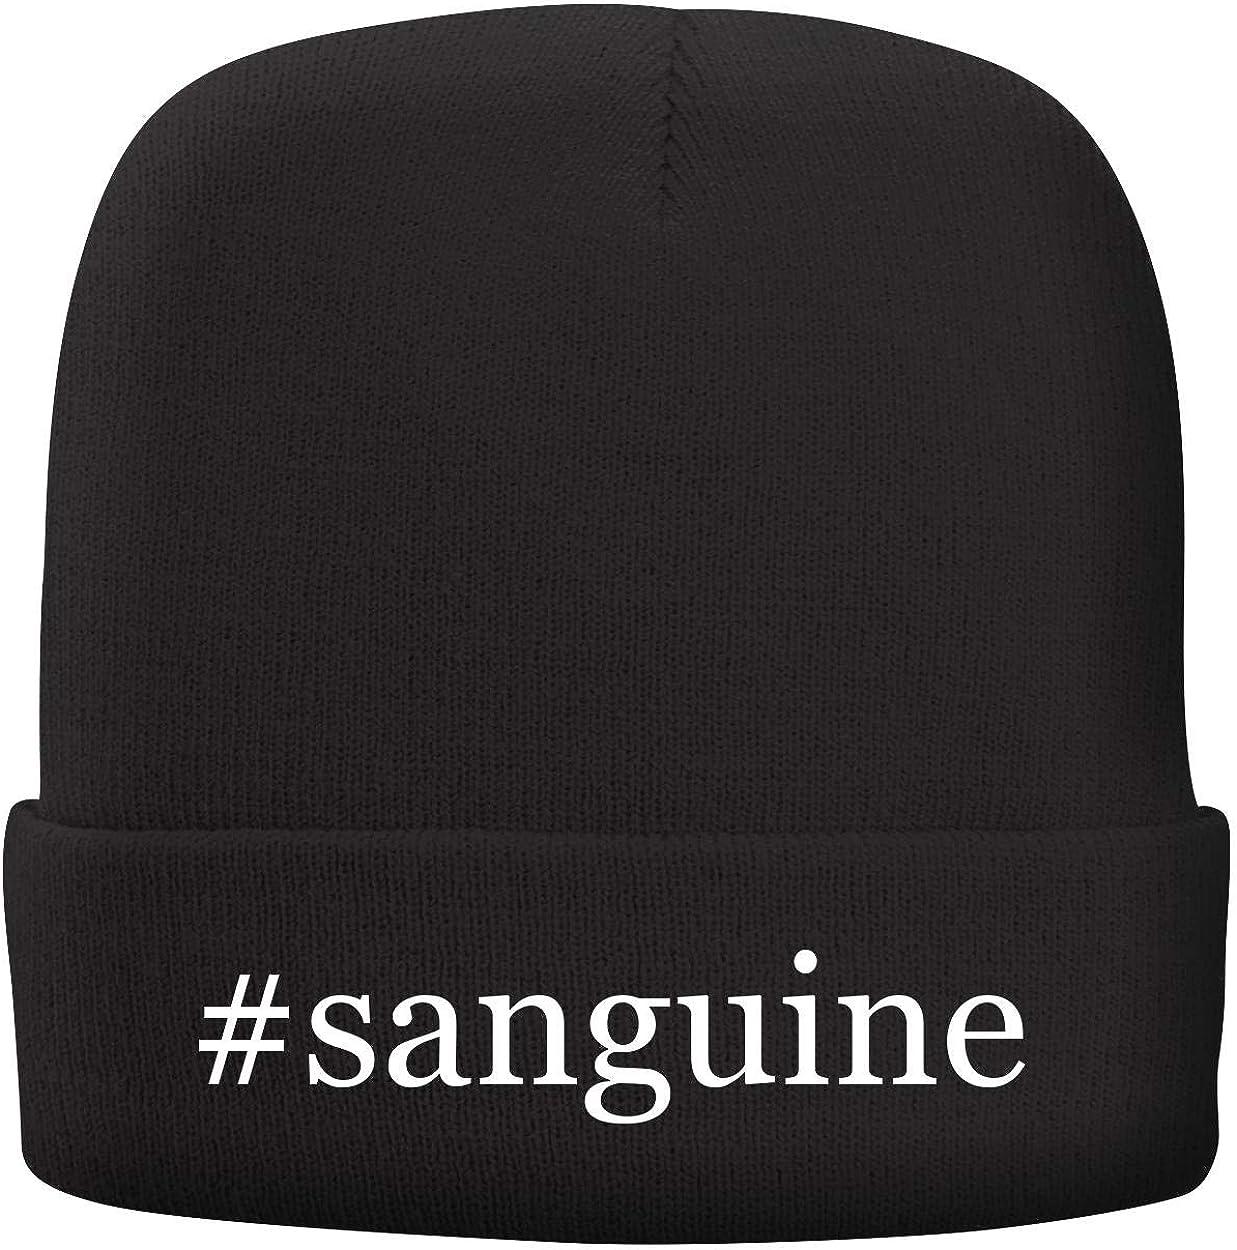 BH Cool Designs #Sanguine Adult Hashtag Comfortable Fleece Lined Beanie